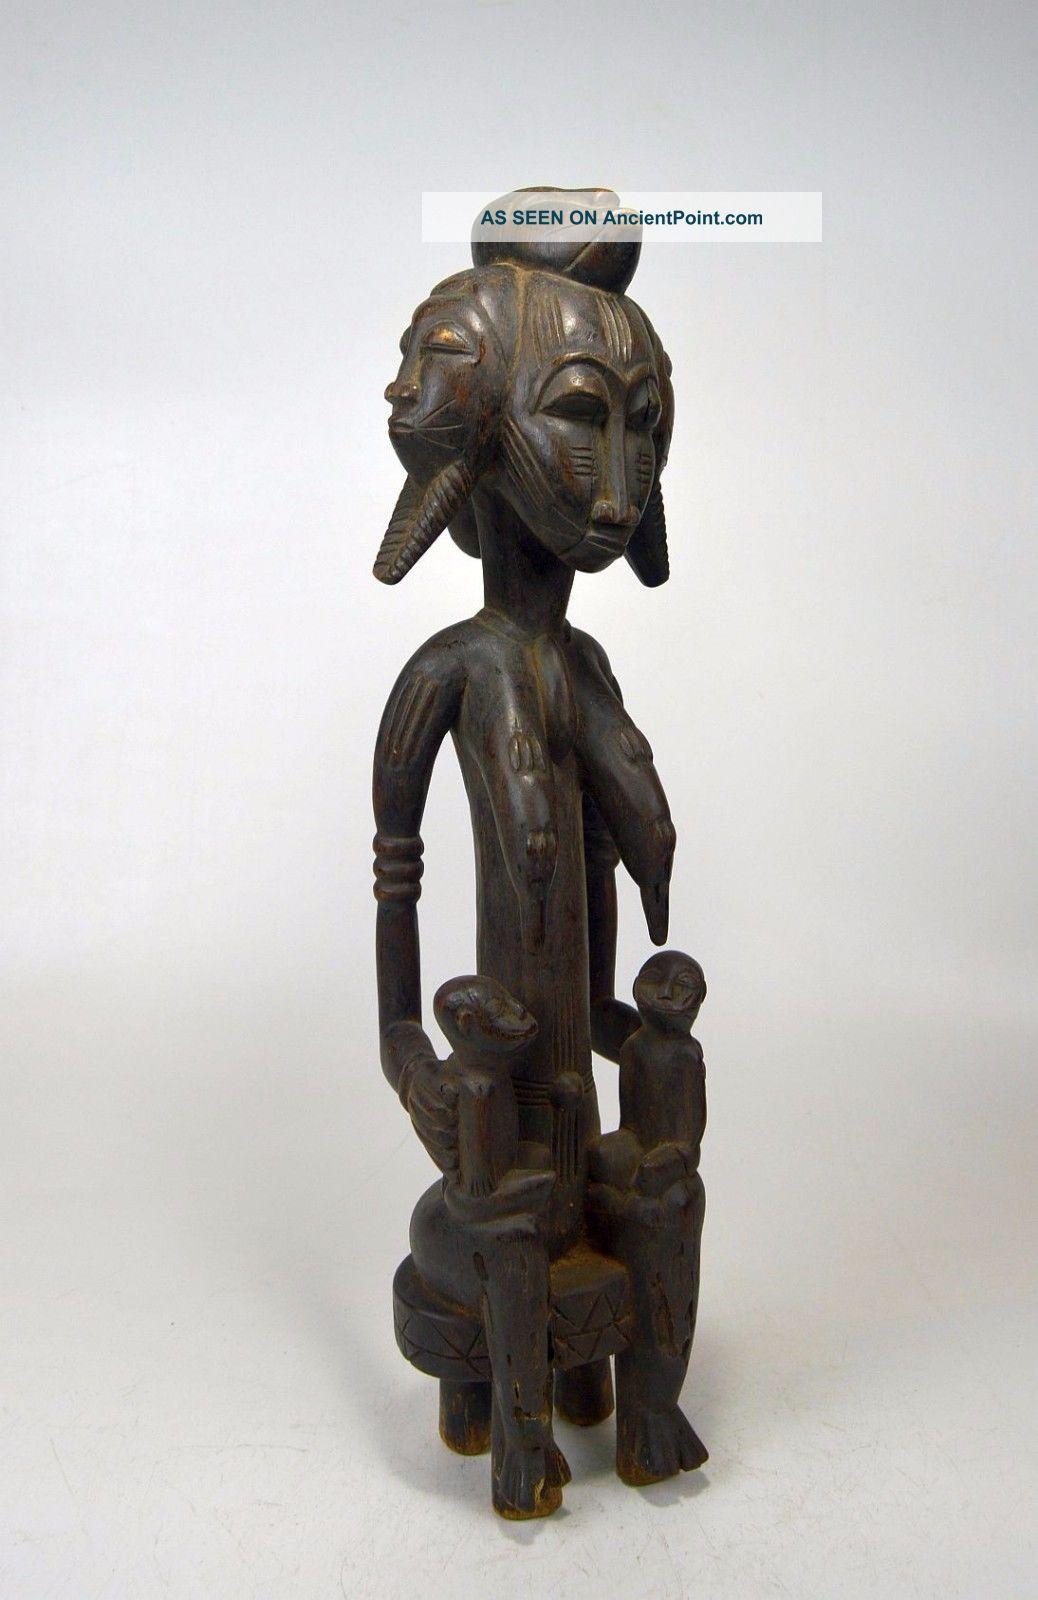 Five Headed Senufo Maternity Sculpture,  African Tribal Art Sculptures & Statues photo